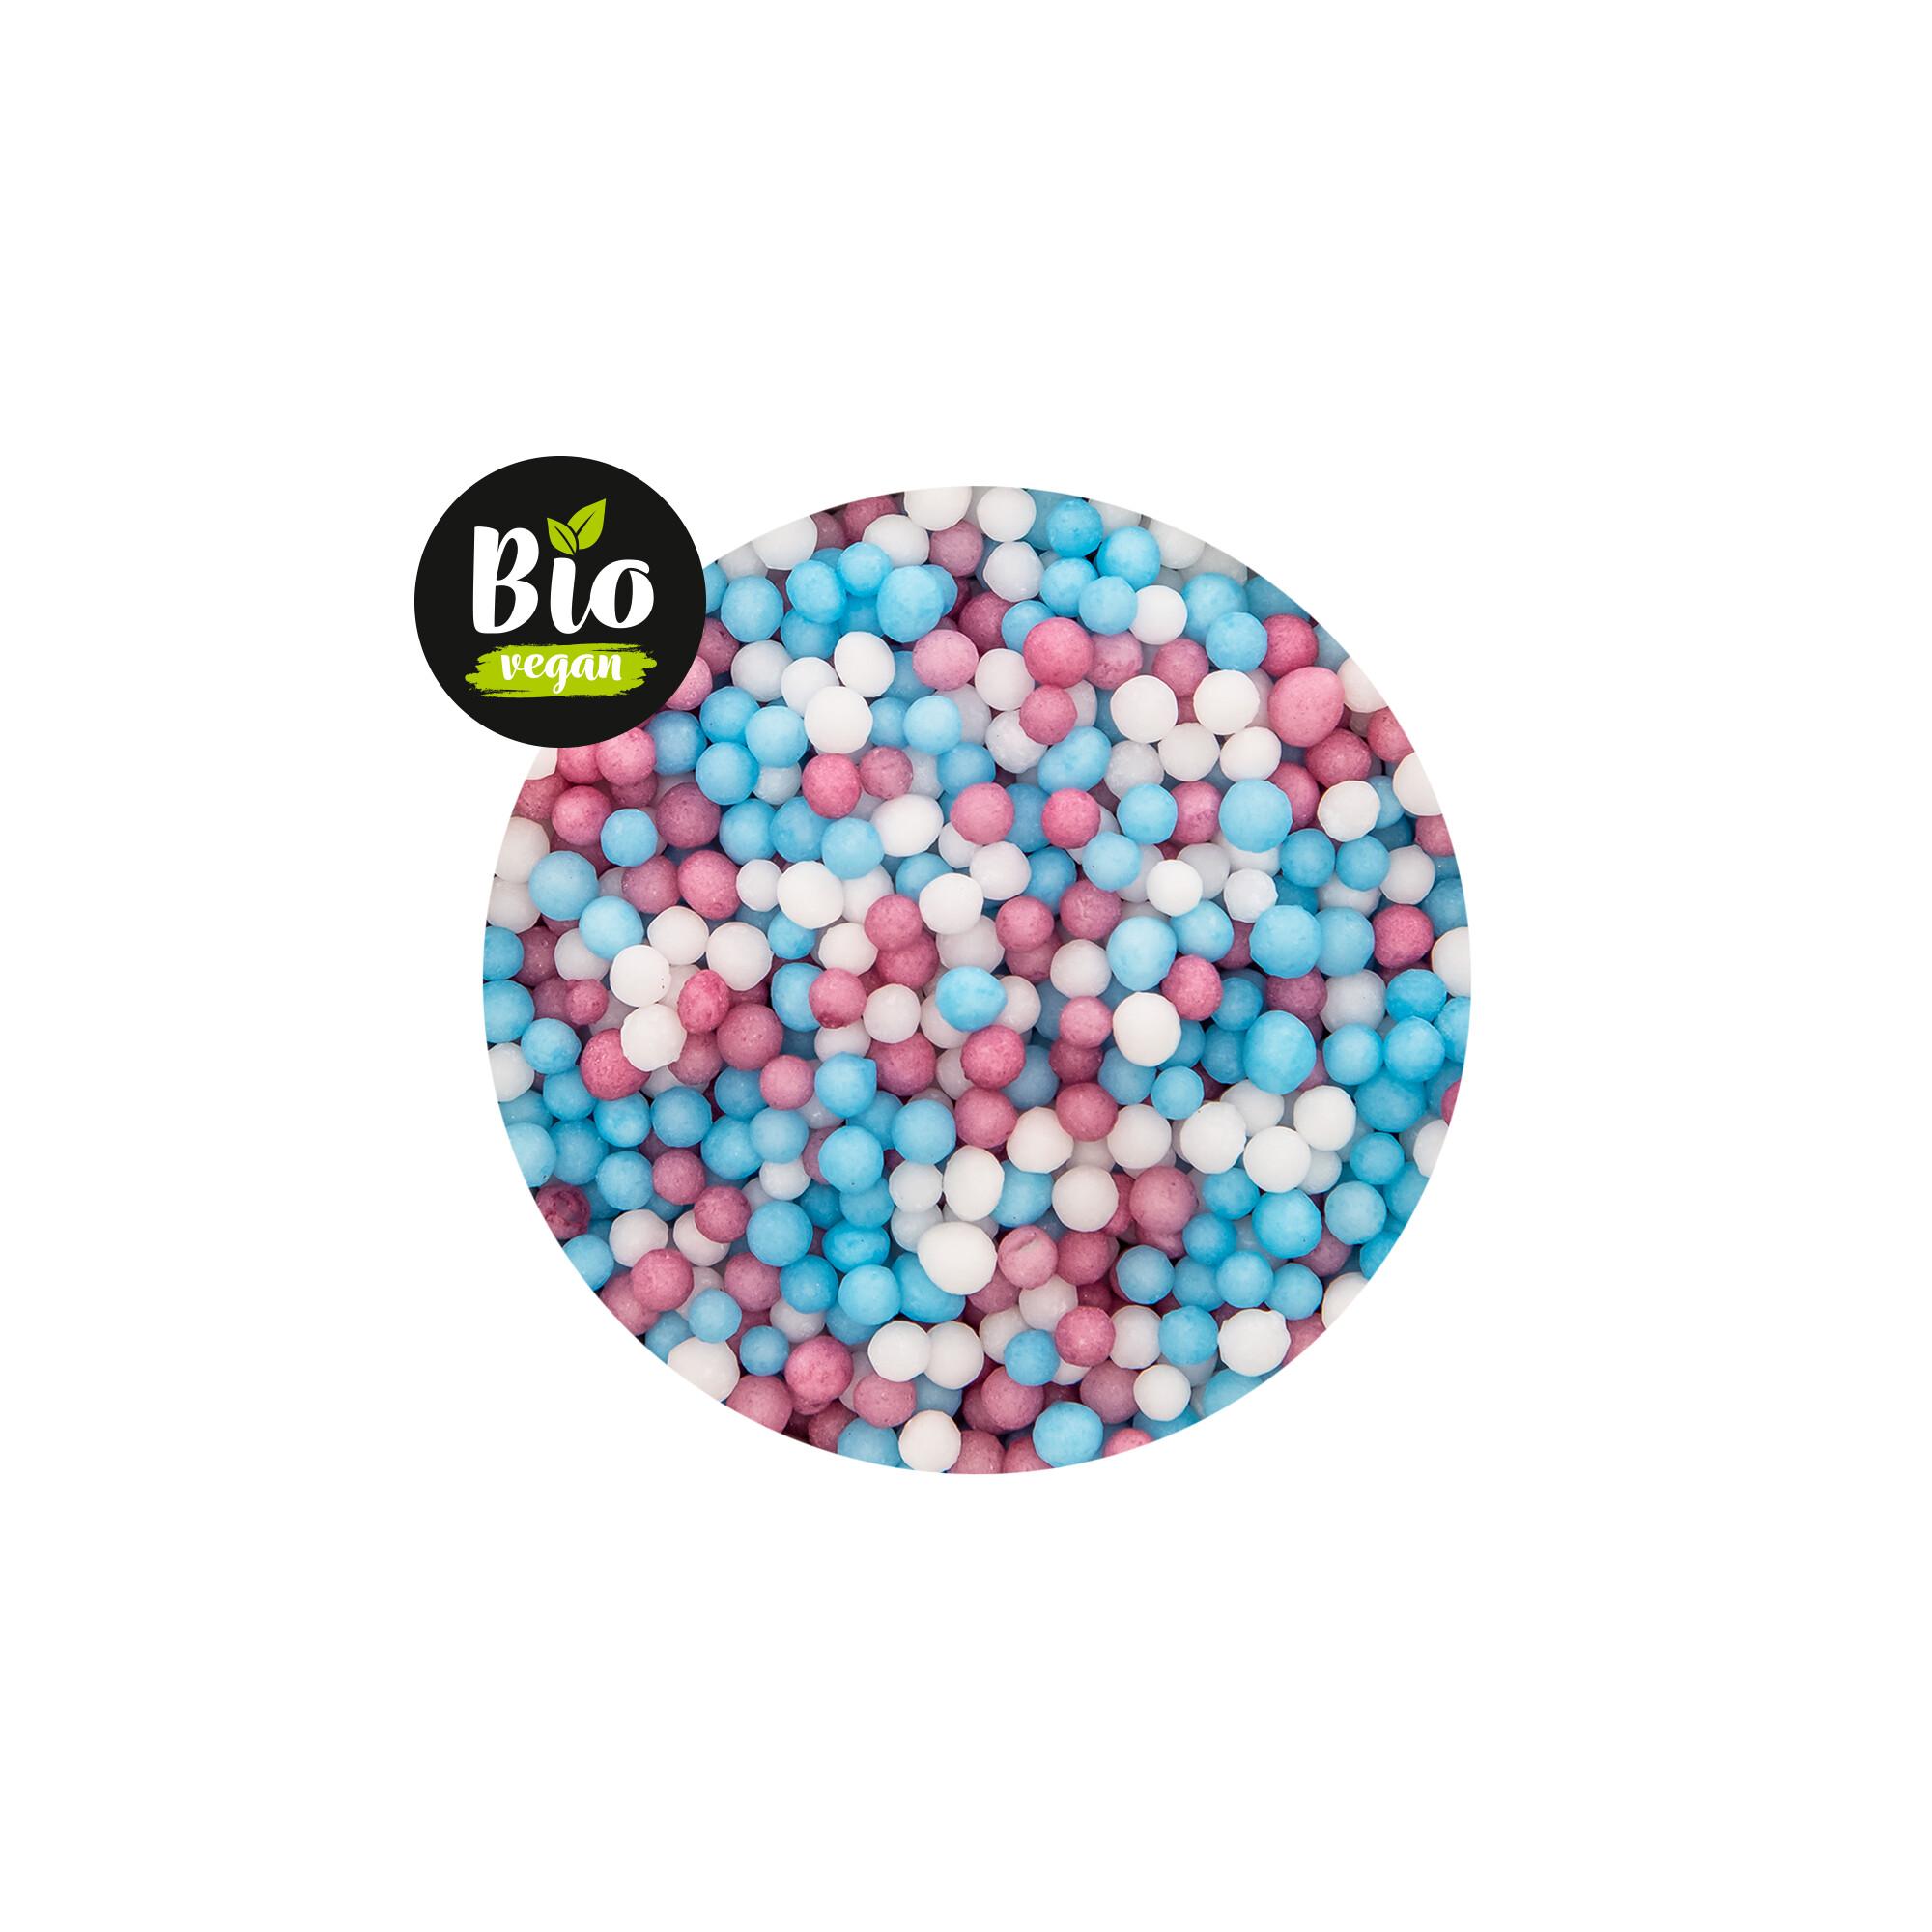 Edible sprinkle decoration - Organic Pearls Mini